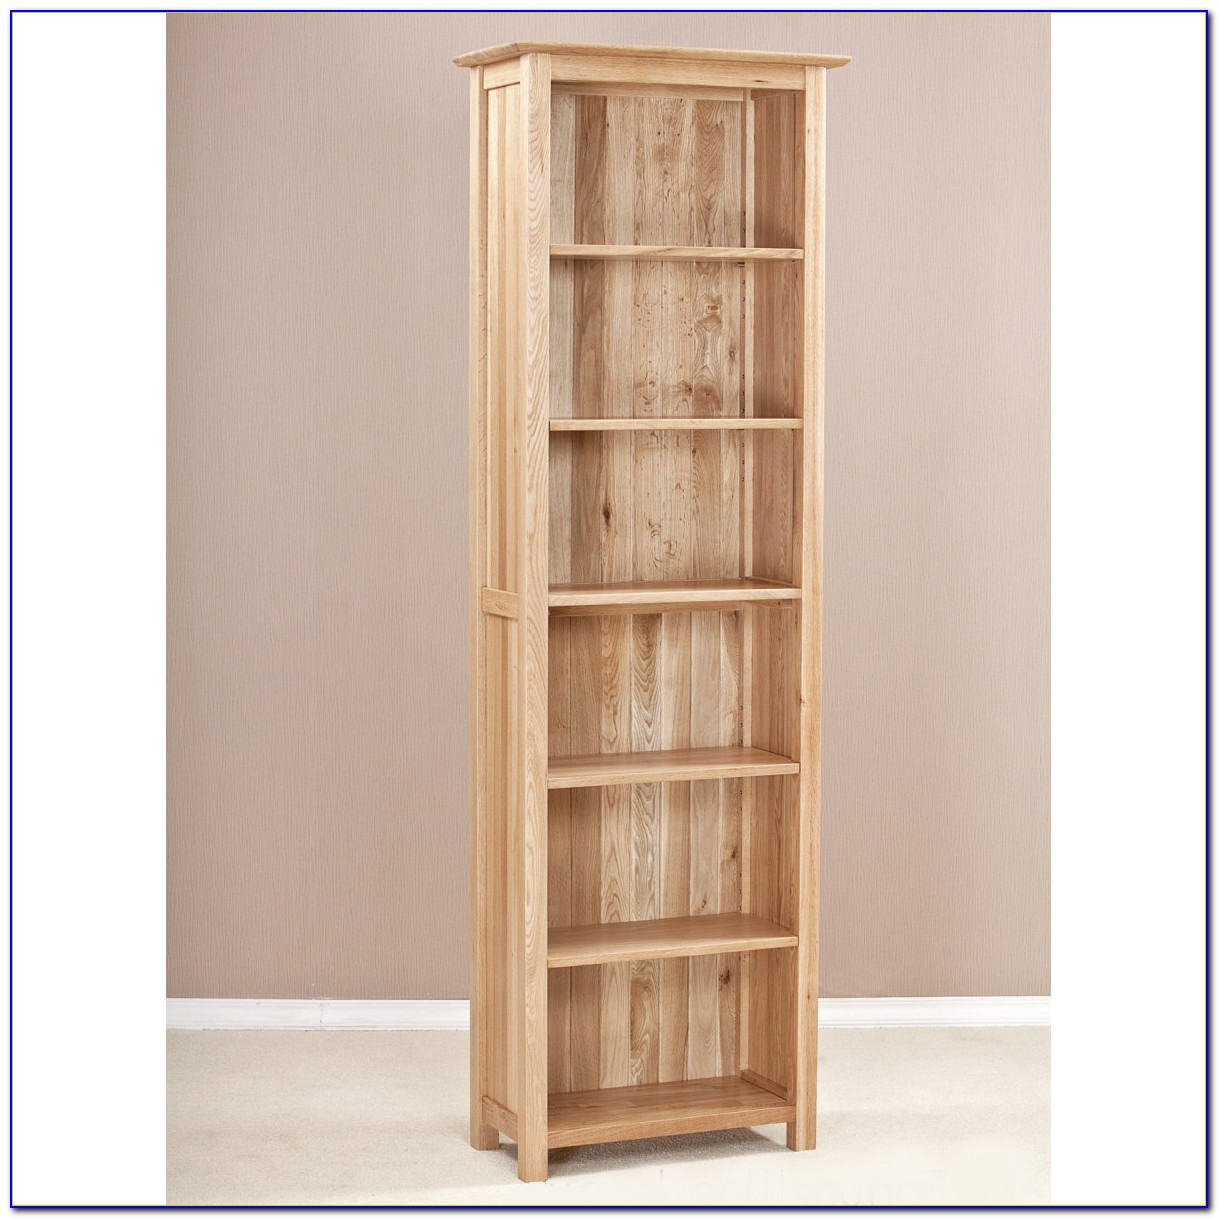 Tall 3 Shelf Bookcase